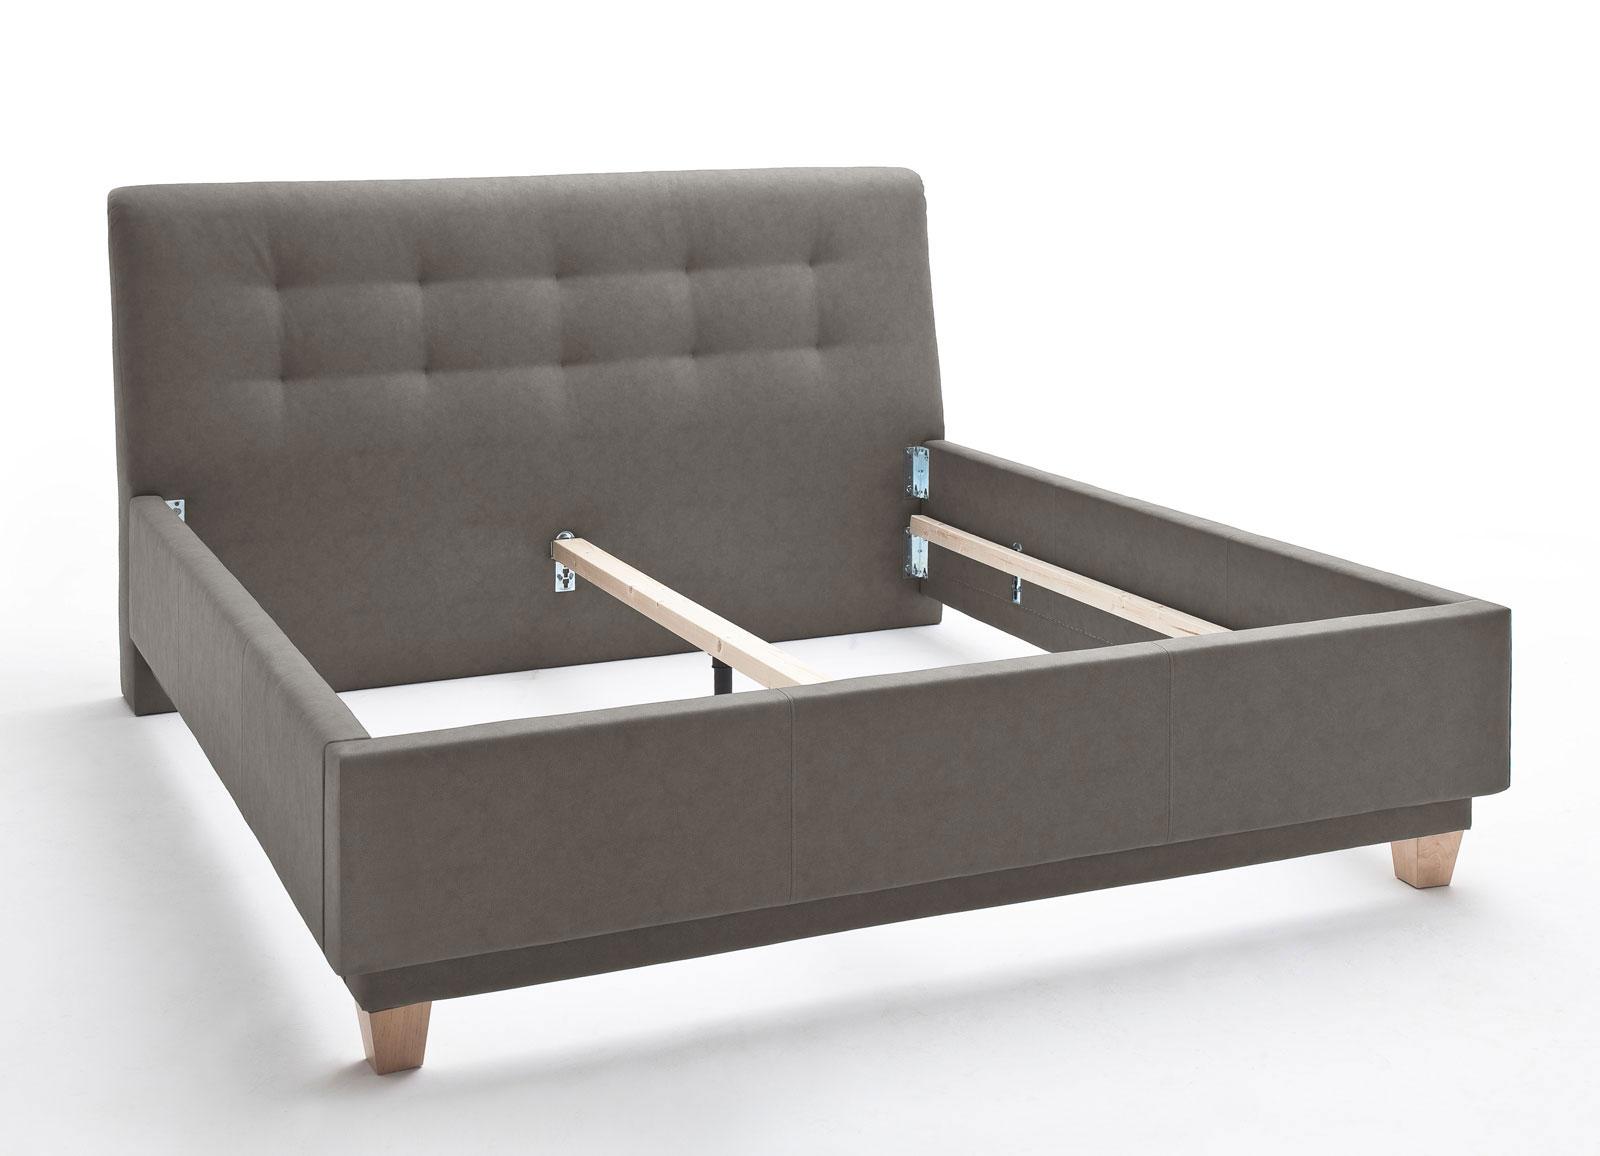 komforthöhe-polsterbett für jumbo-matratzen - saida | betten.de, Hause deko